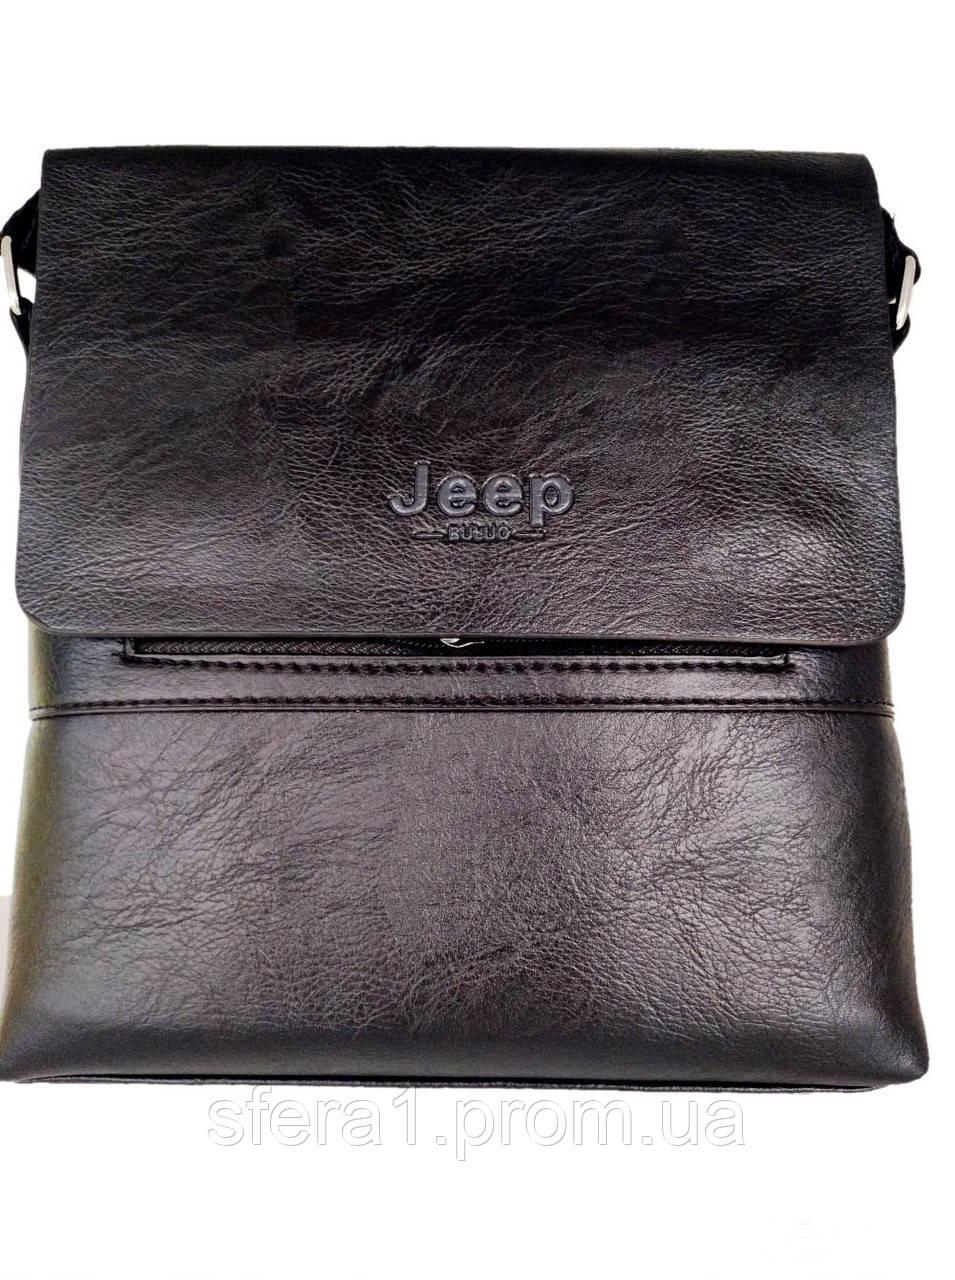 98fcdfa06361 Мужская сумка Jeep Buluo 9008 ЧЕРНАЯ, Новинка - Интернет - магазин